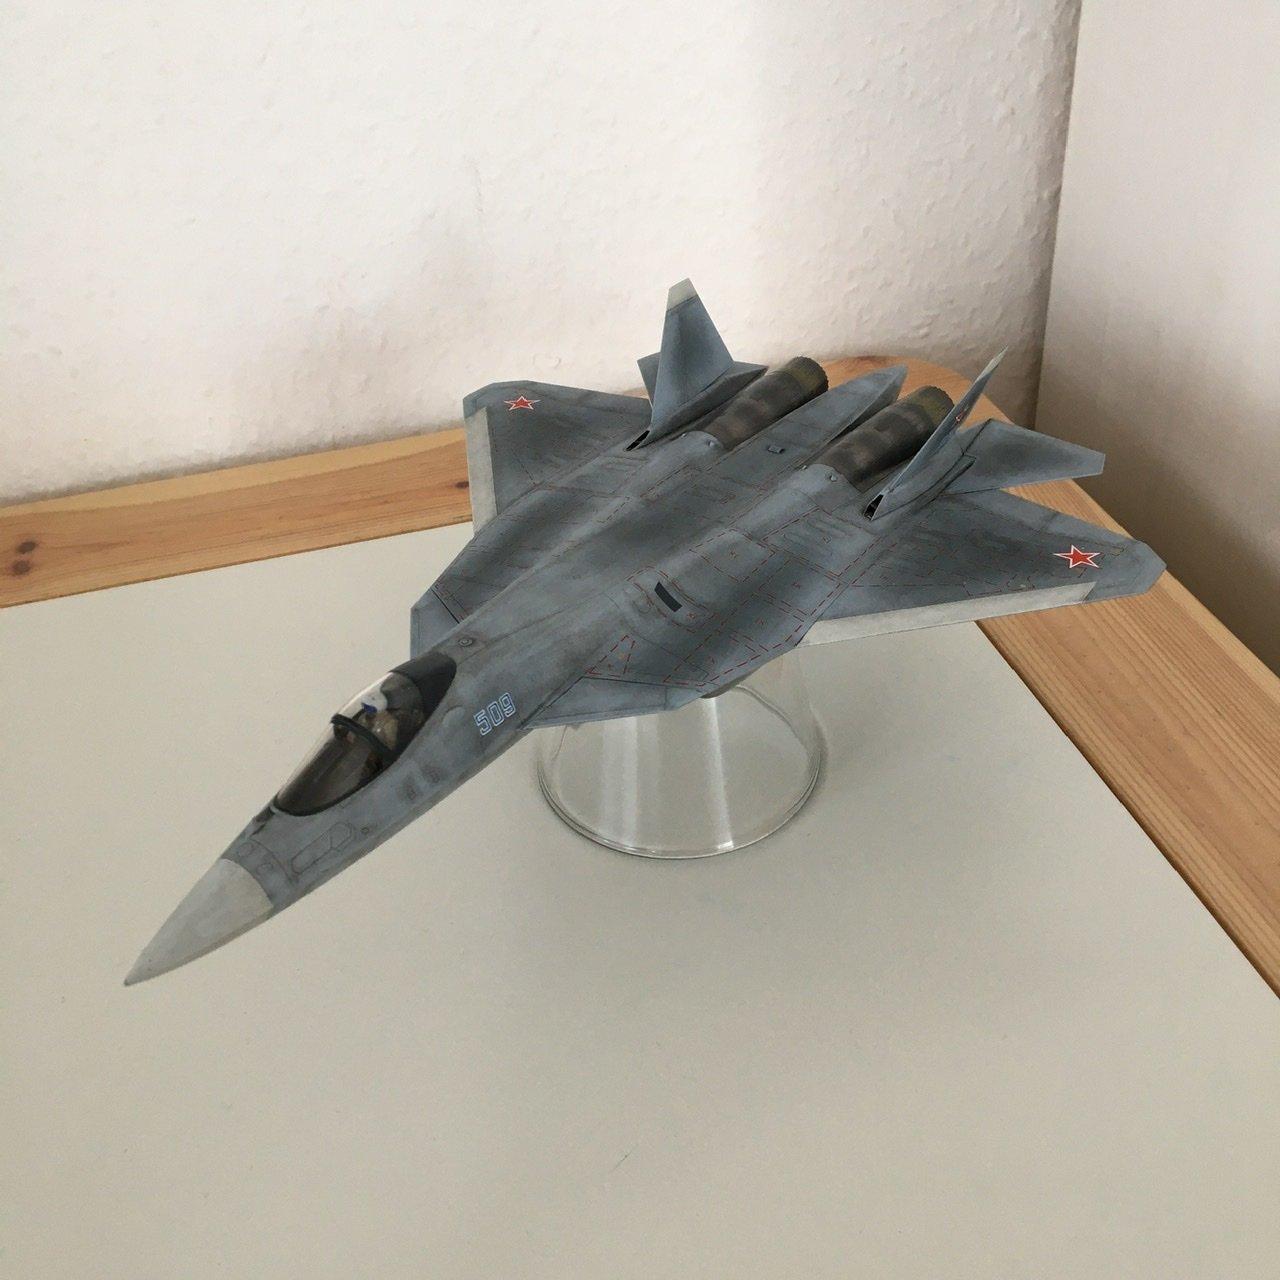 Su-57.jpeg.38ba185f4594b3a9e720d2a54a7ba87a.jpeg